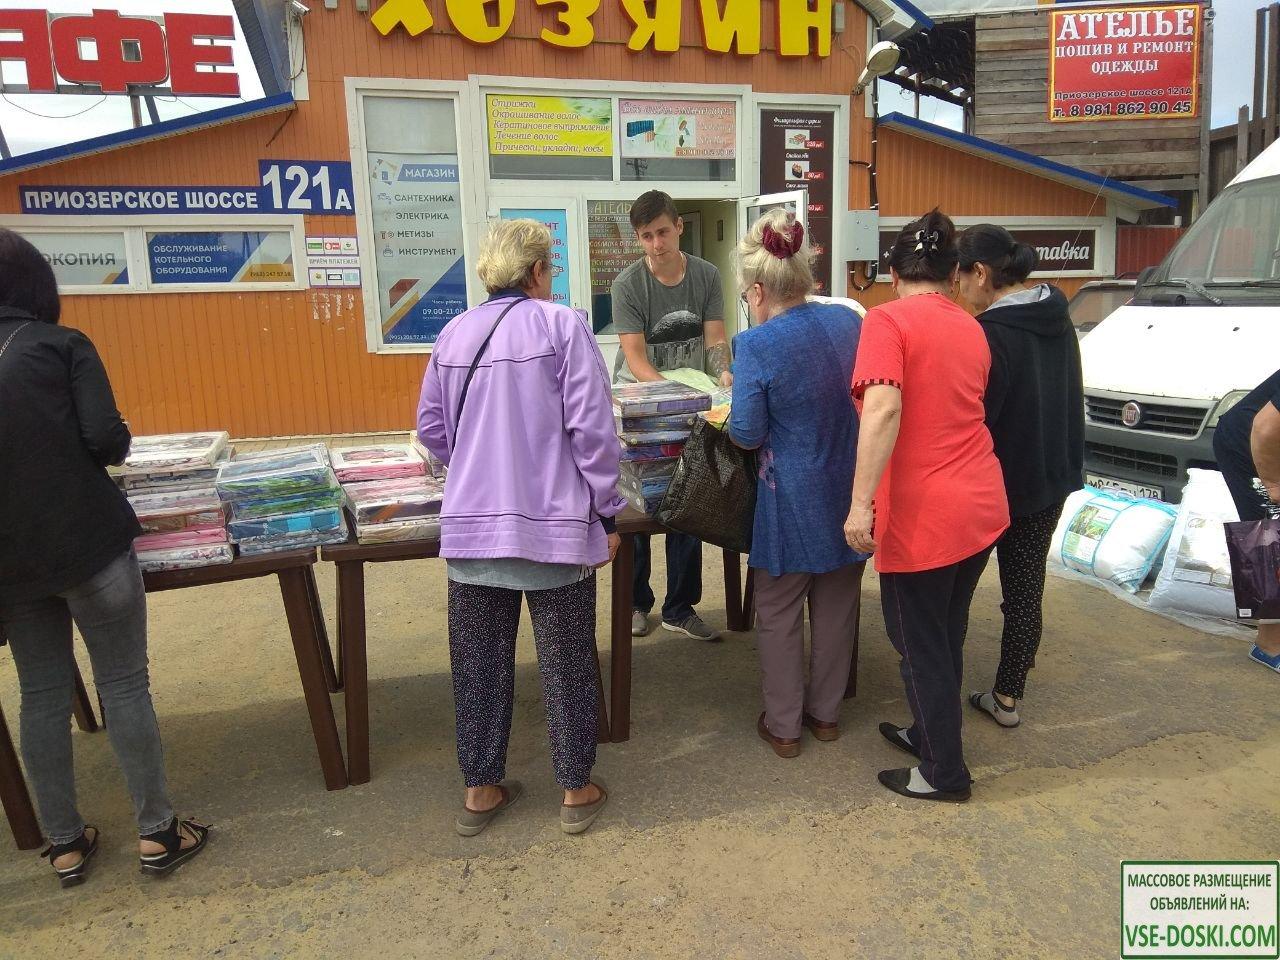 Участок под распродажу перед Торговым Центром - 2/3